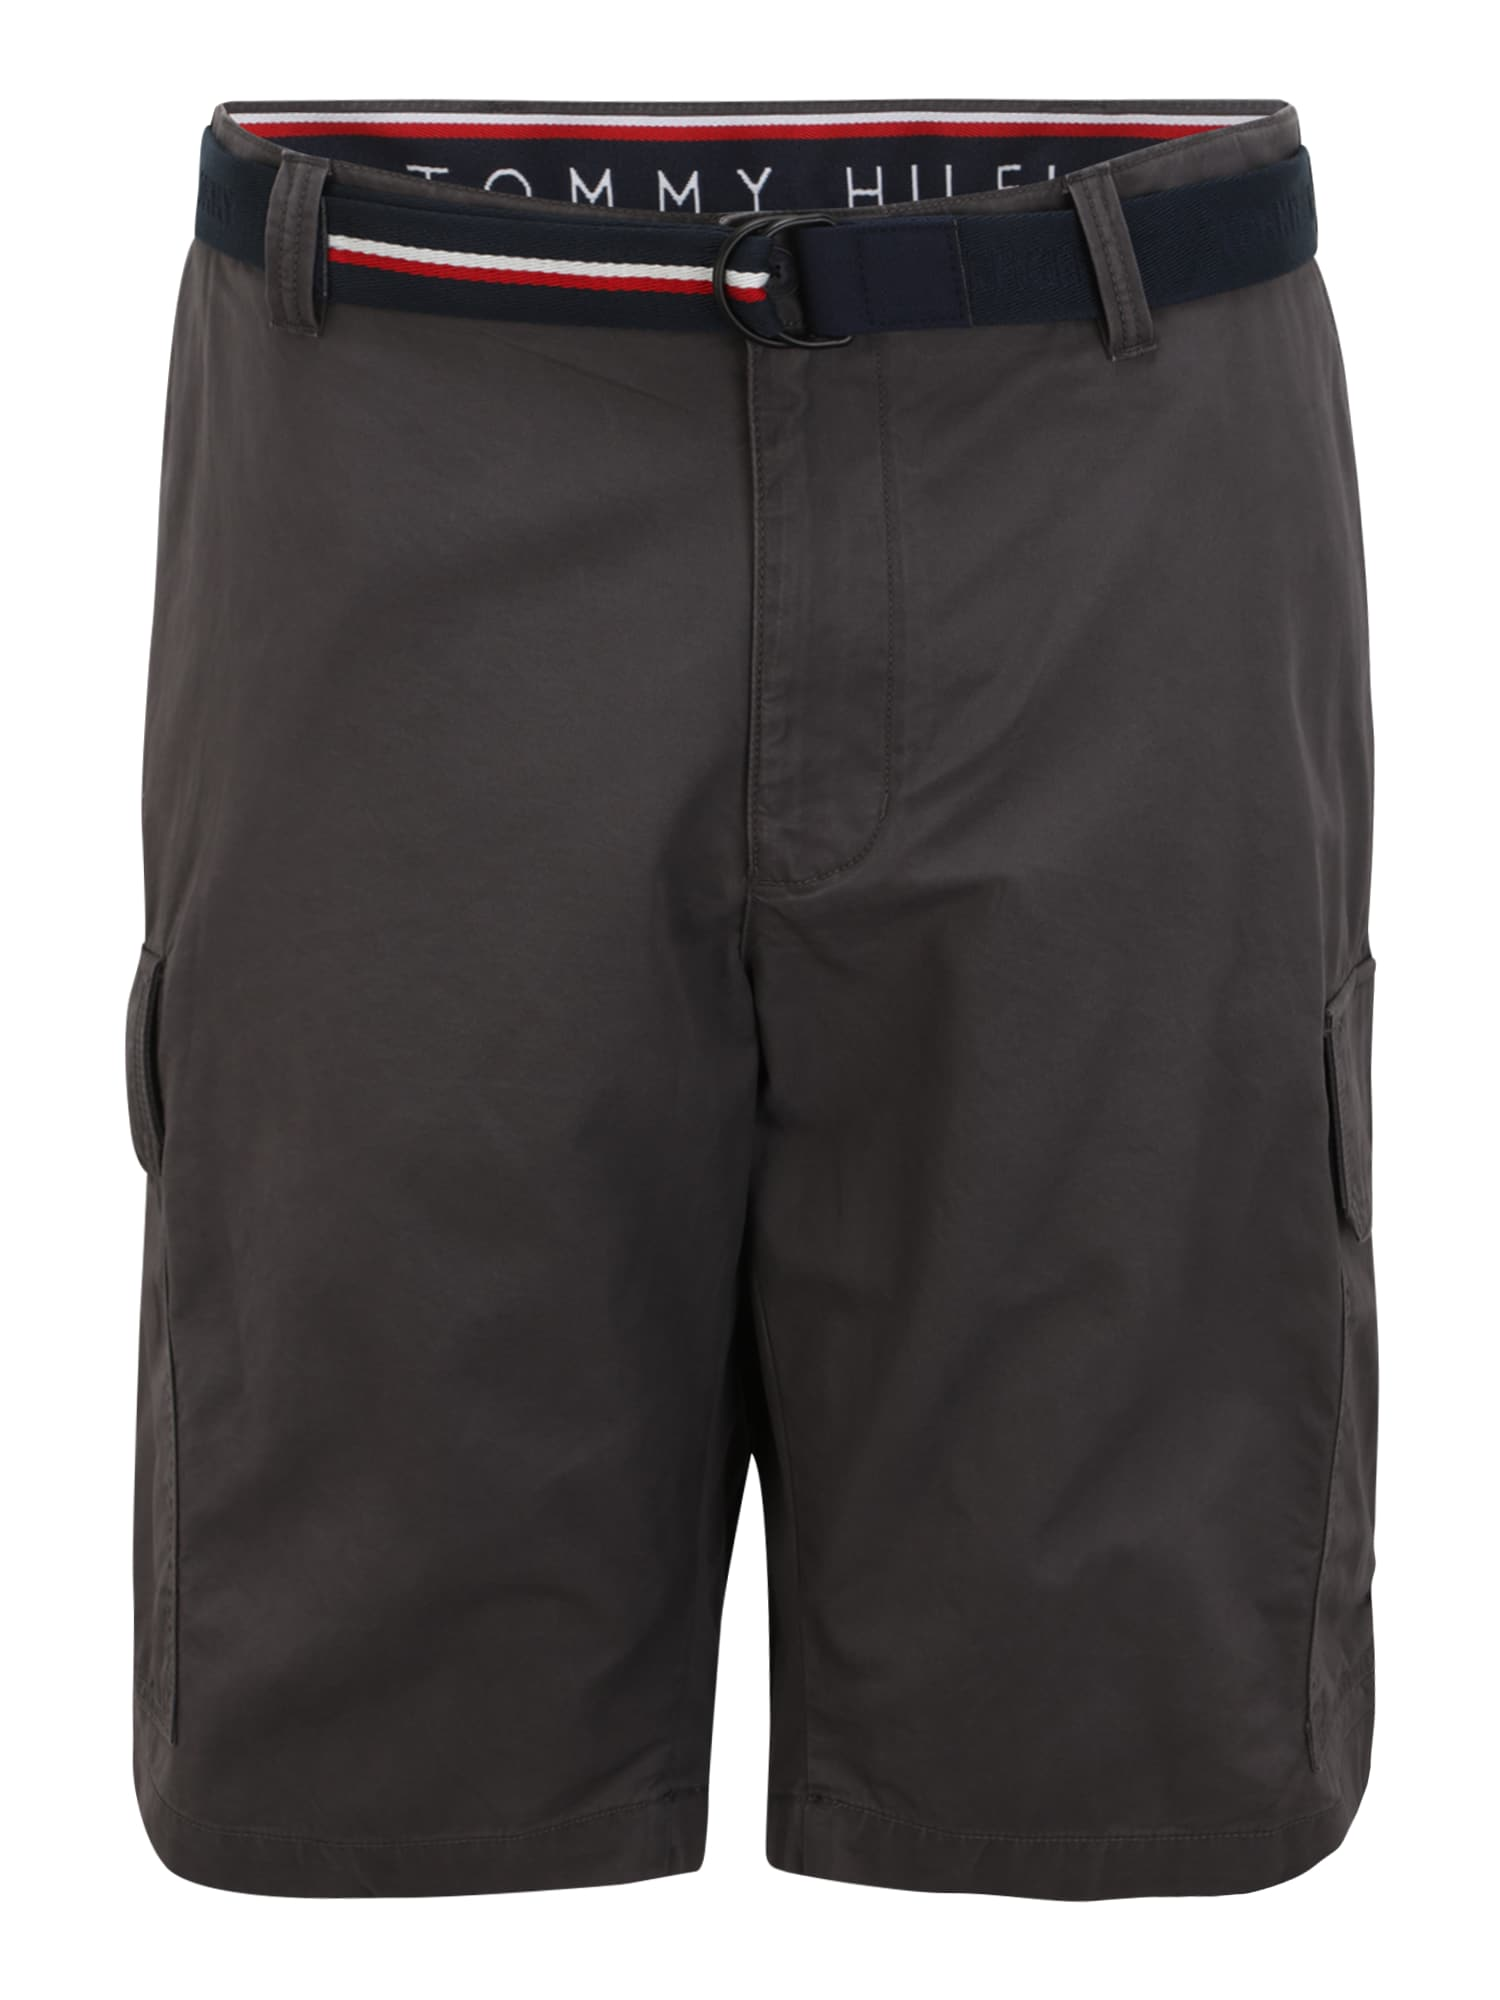 Tommy Hilfiger Big & Tall Laisvo stiliaus kelnės